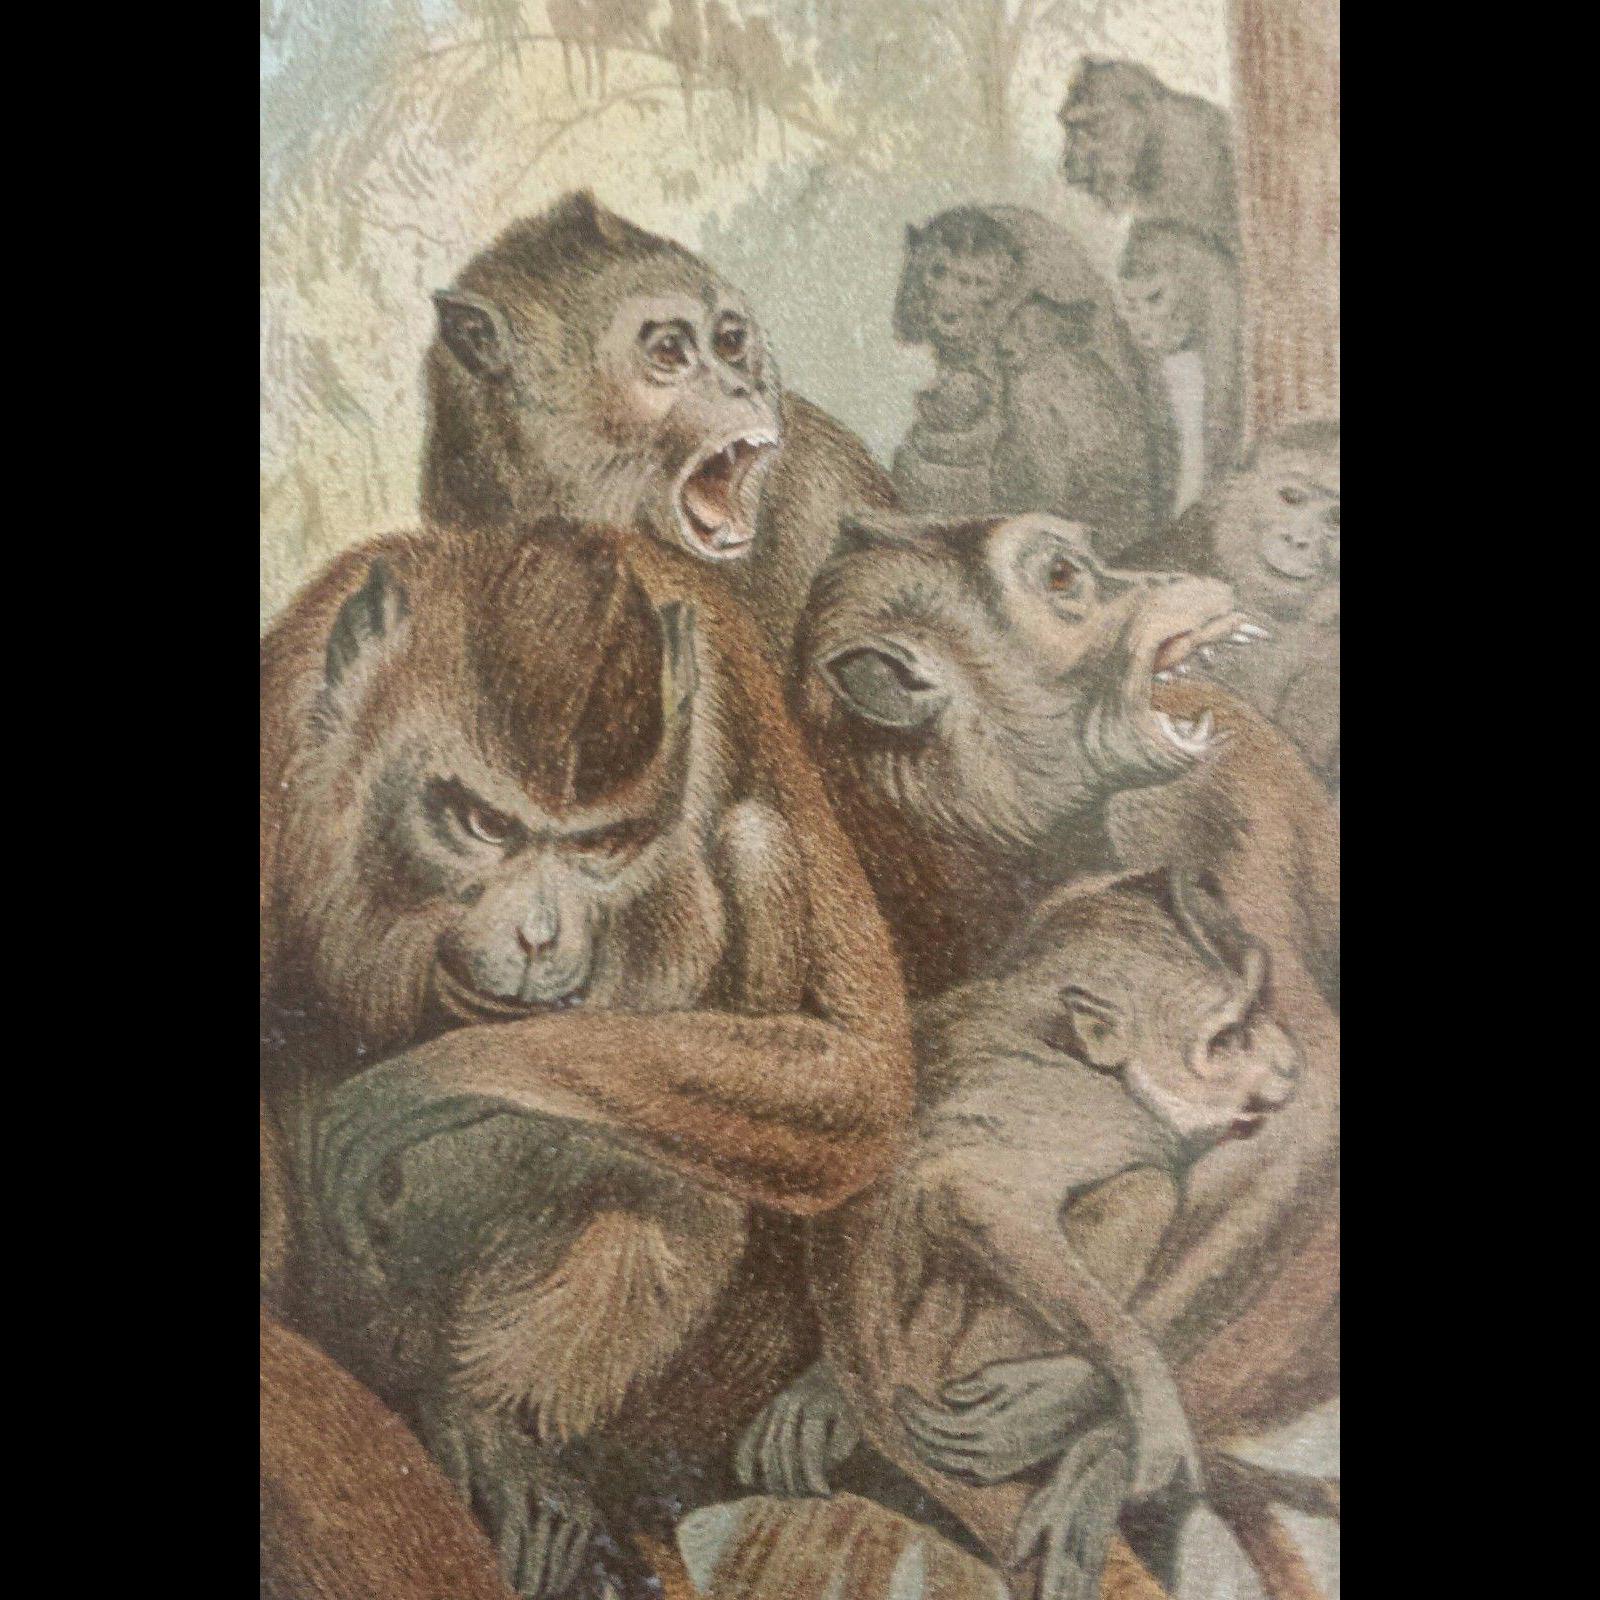 1890's Brehm Chromolithograph - Makak - Macaque Monkeys